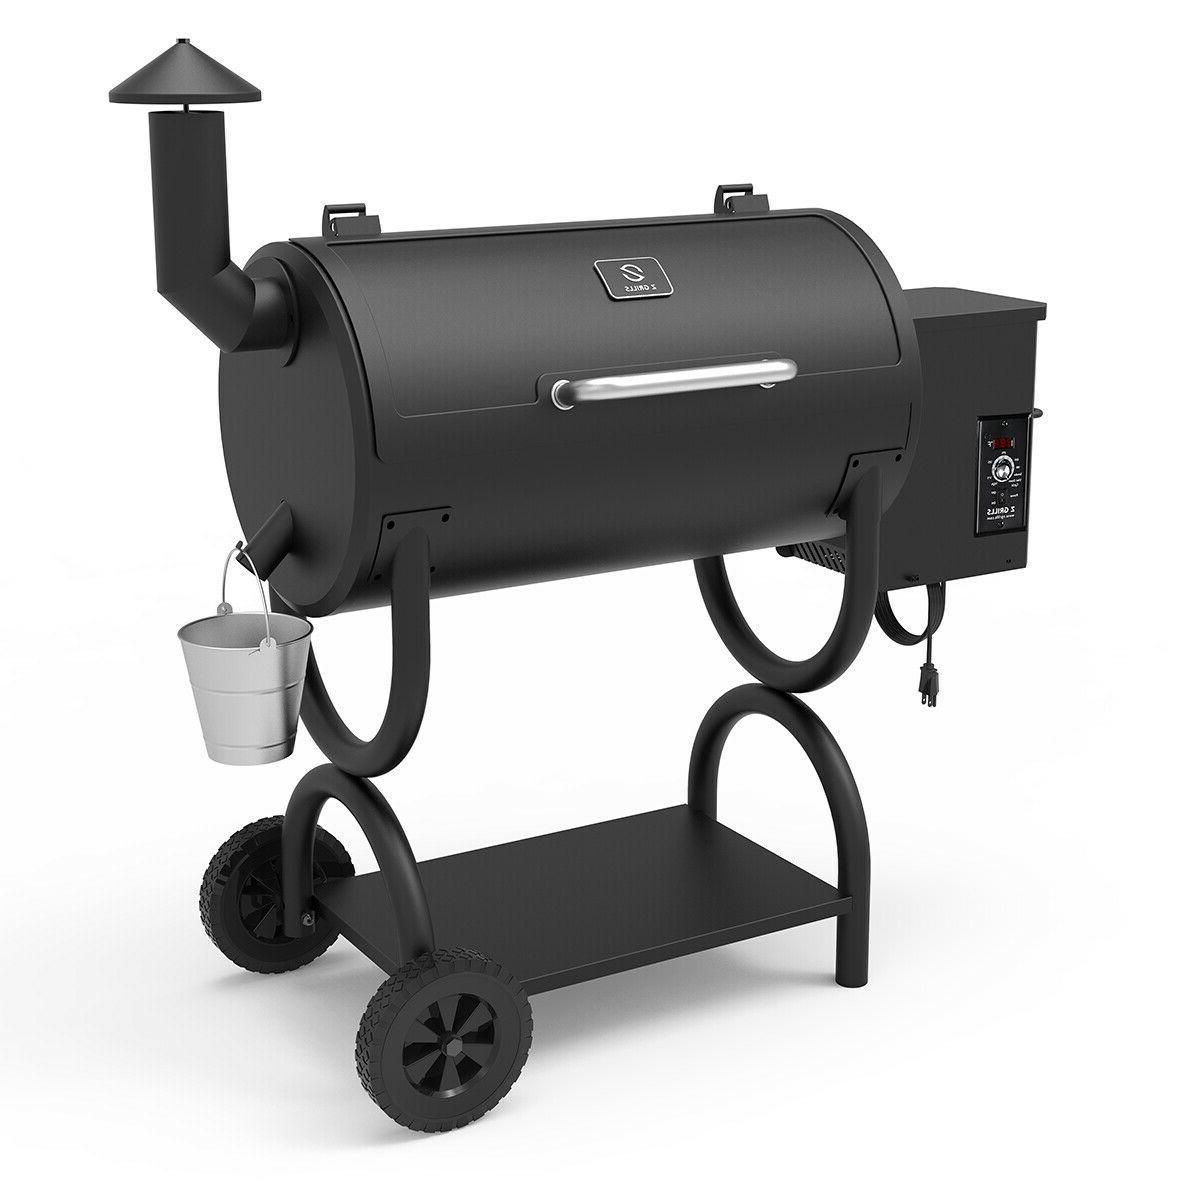 Z Grills Wood Grill Smoker